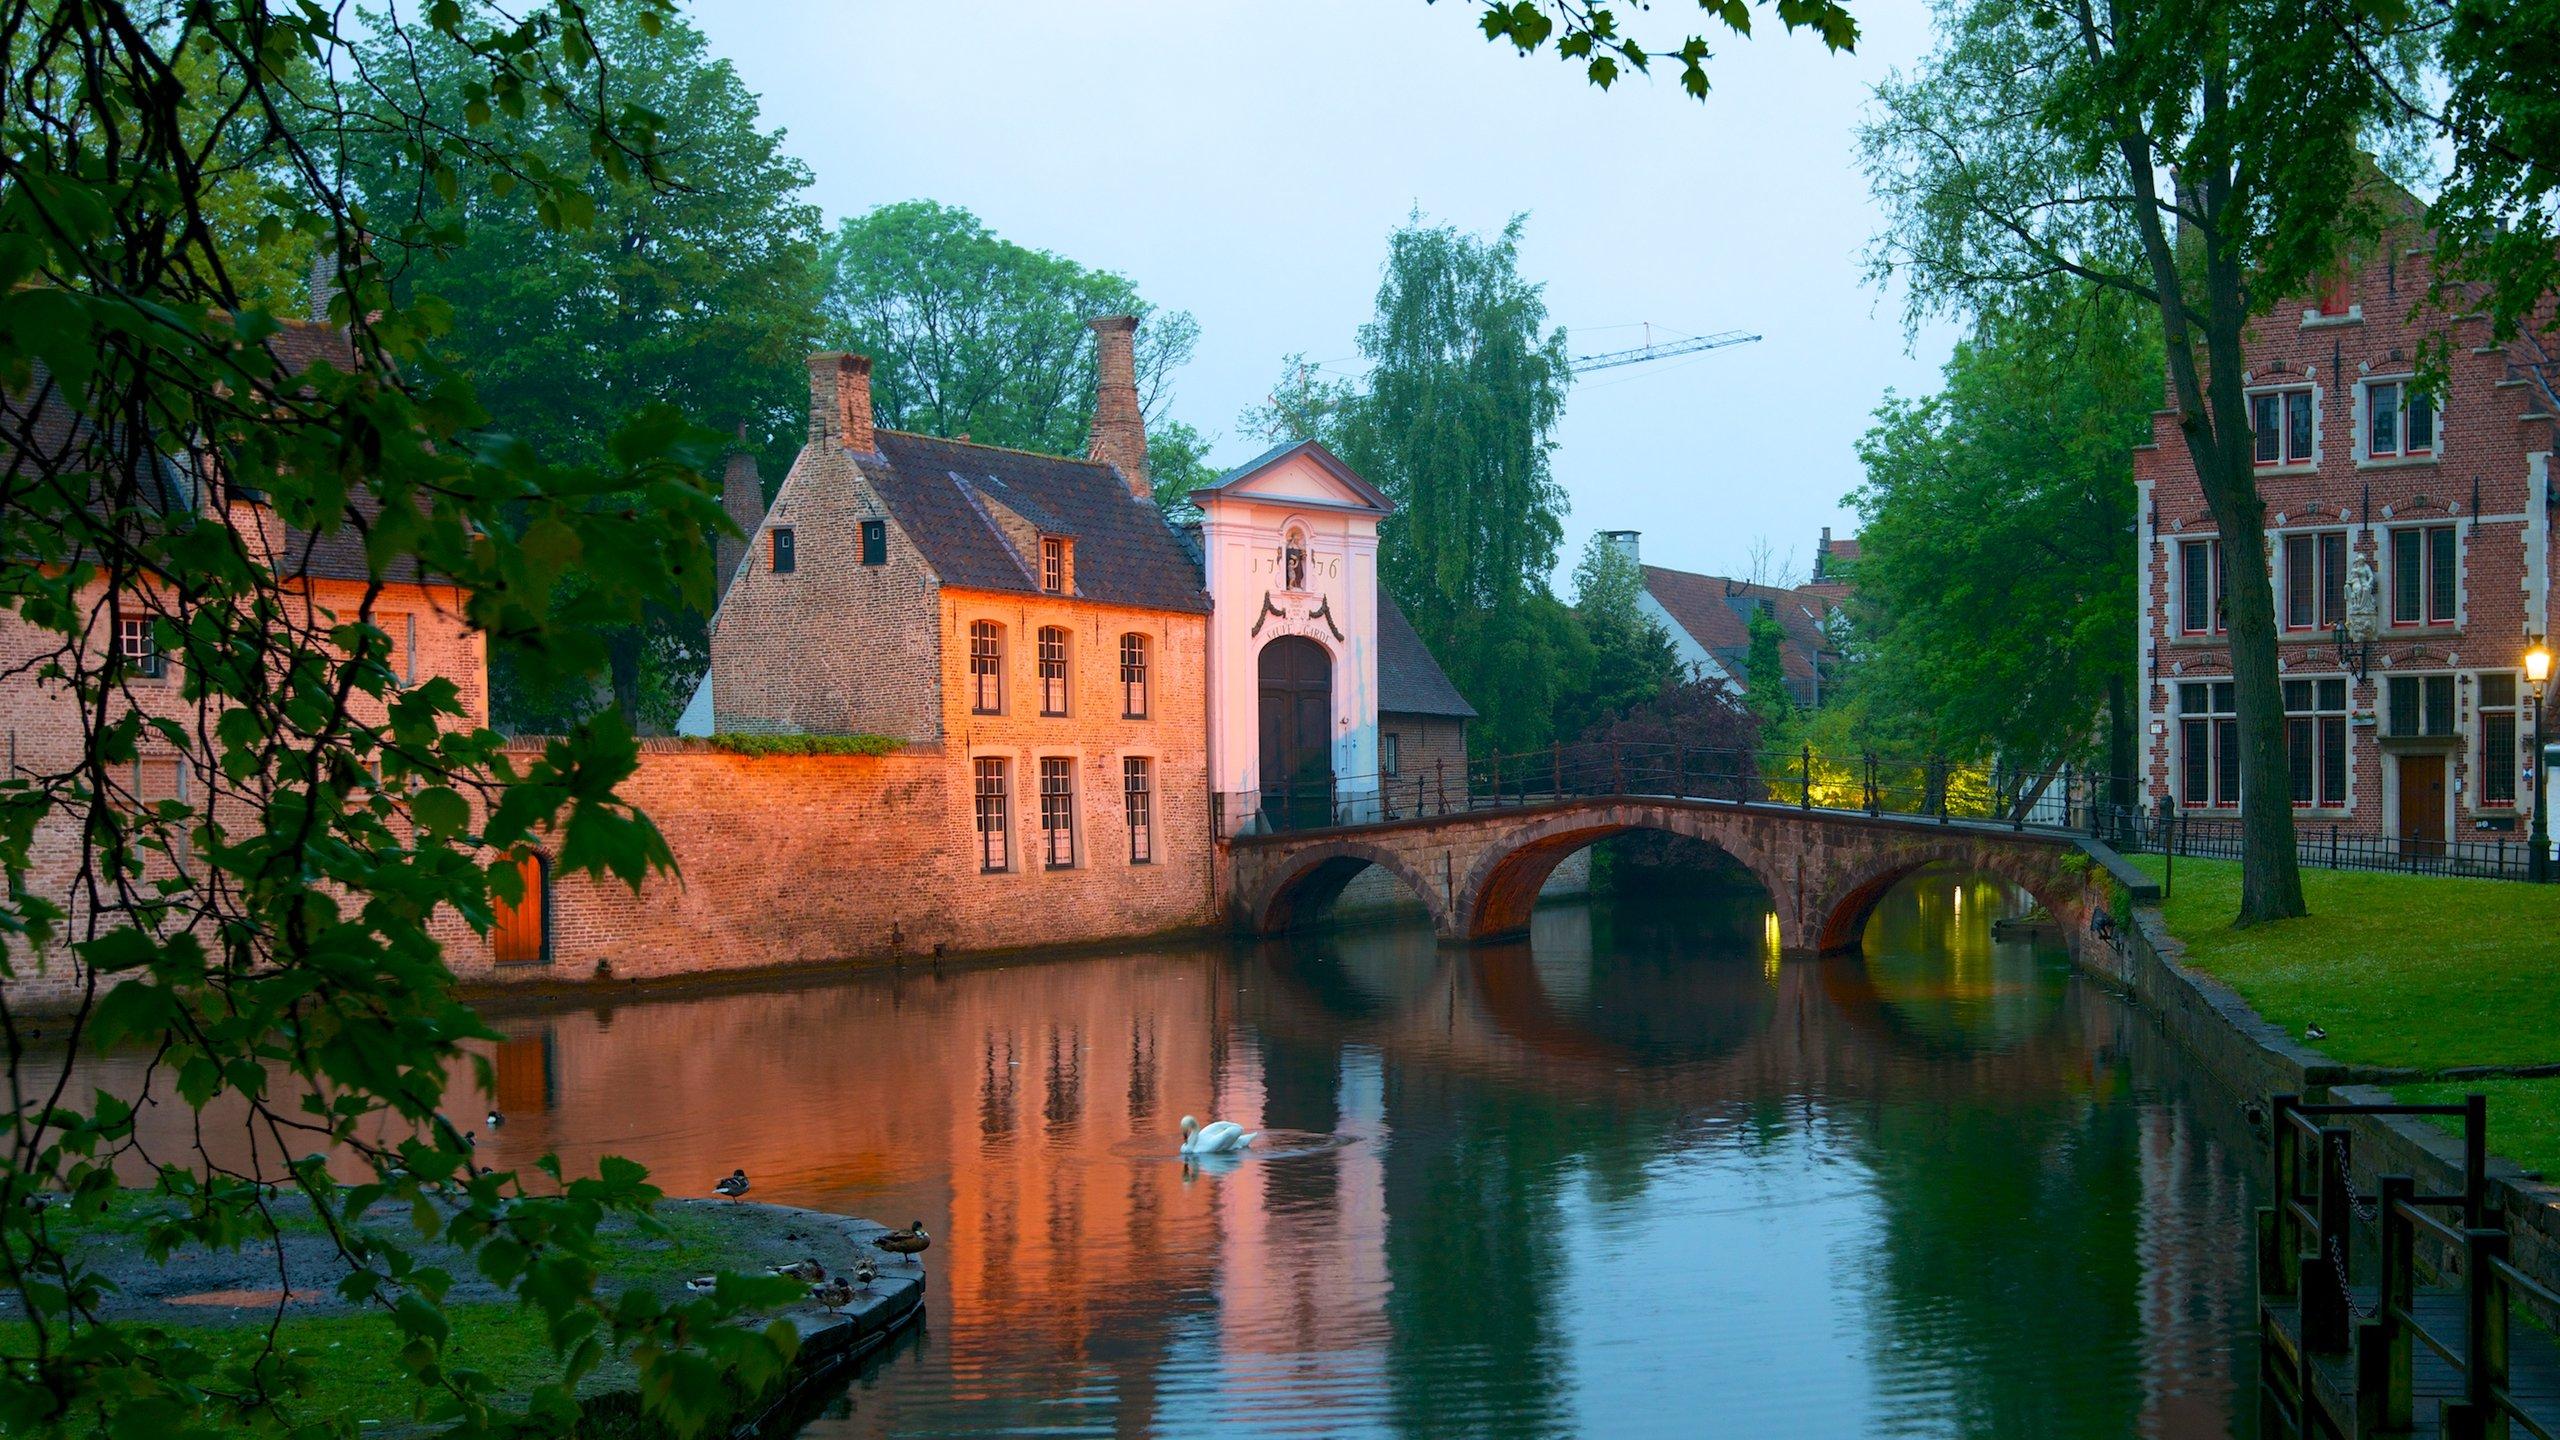 Beginenhof, Brügge, Bezirk Flandern, Belgien